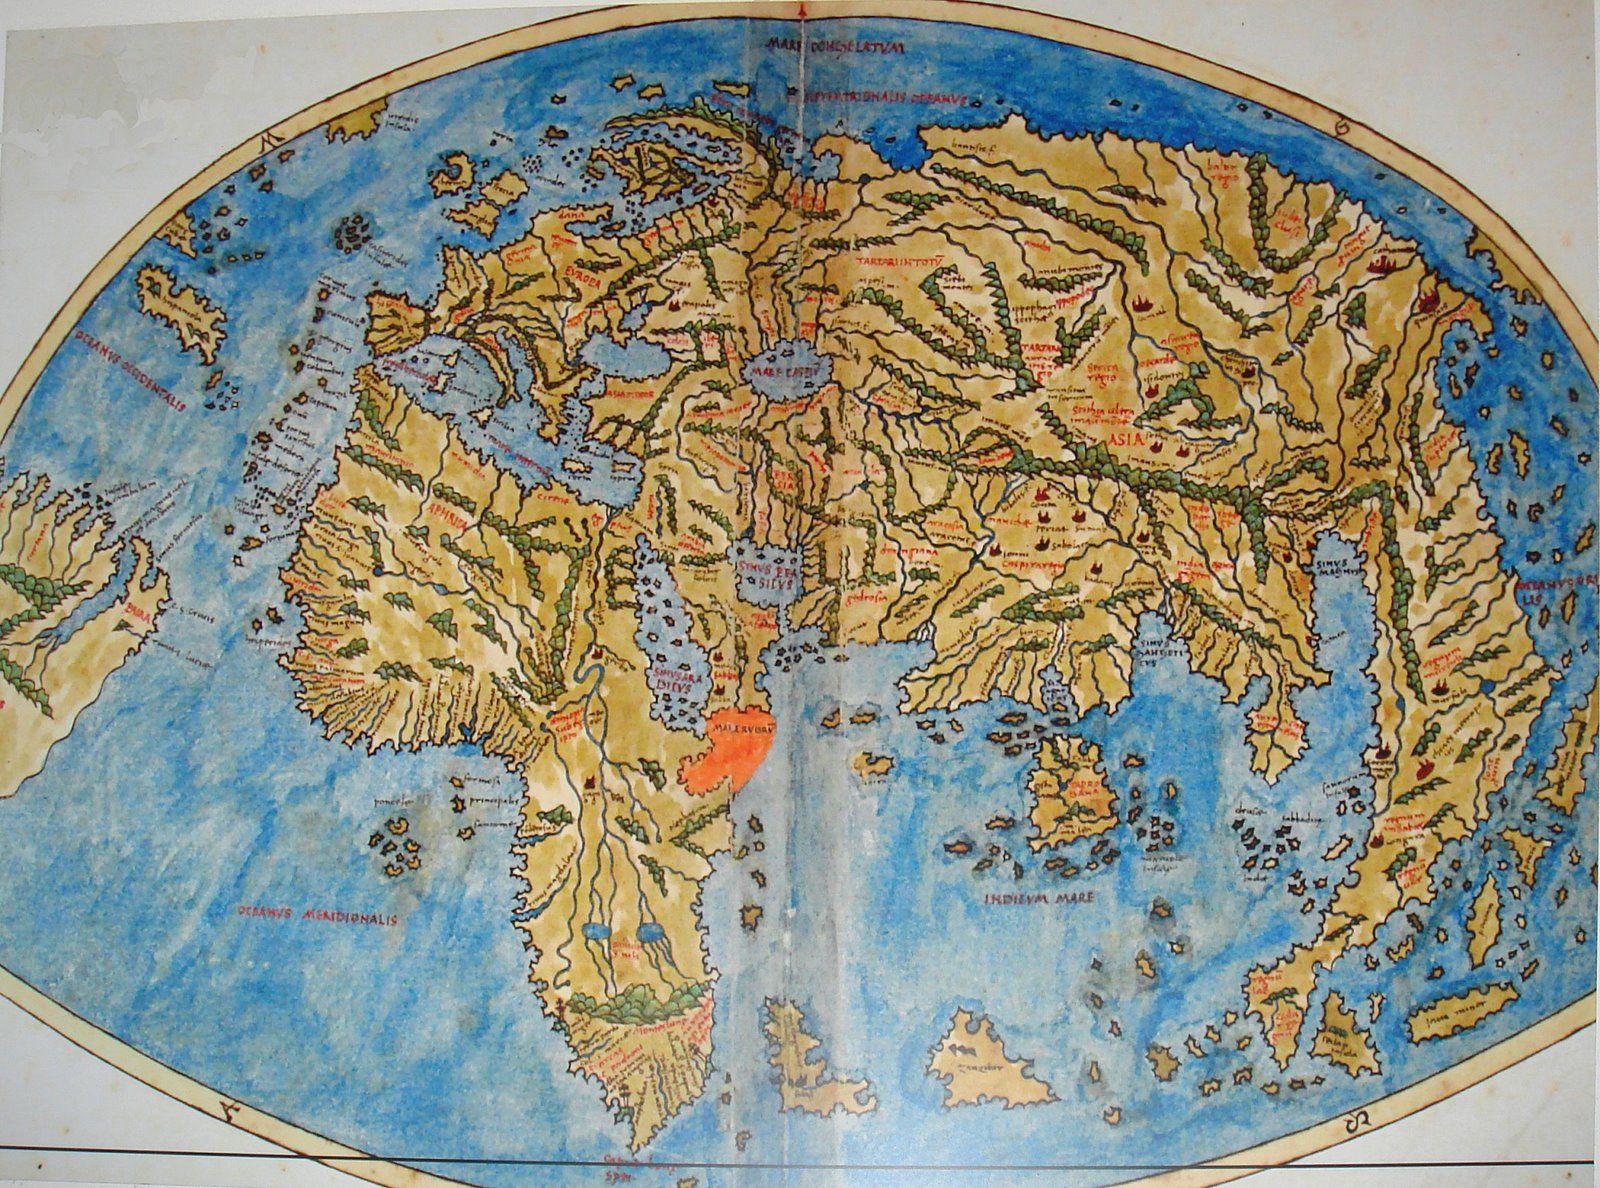 Pietrocoppo2g 16001188 antique specialty maps pinterest pietrocoppo2g 16001188 gumiabroncs Images